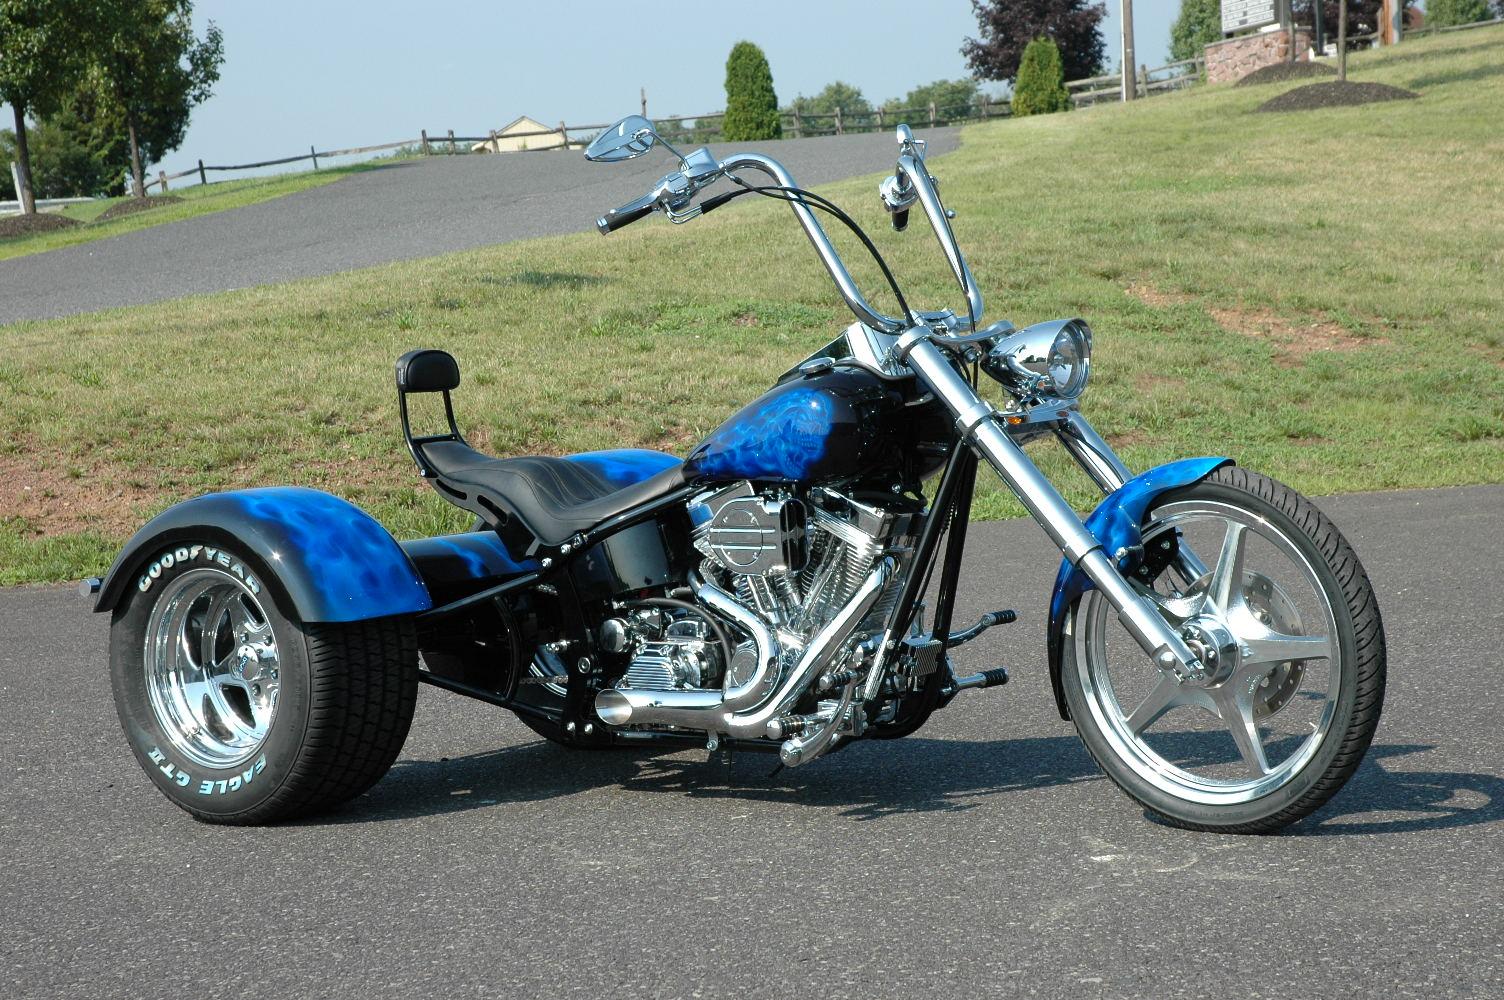 biker excalibur ii trike by american classic motors. Black Bedroom Furniture Sets. Home Design Ideas